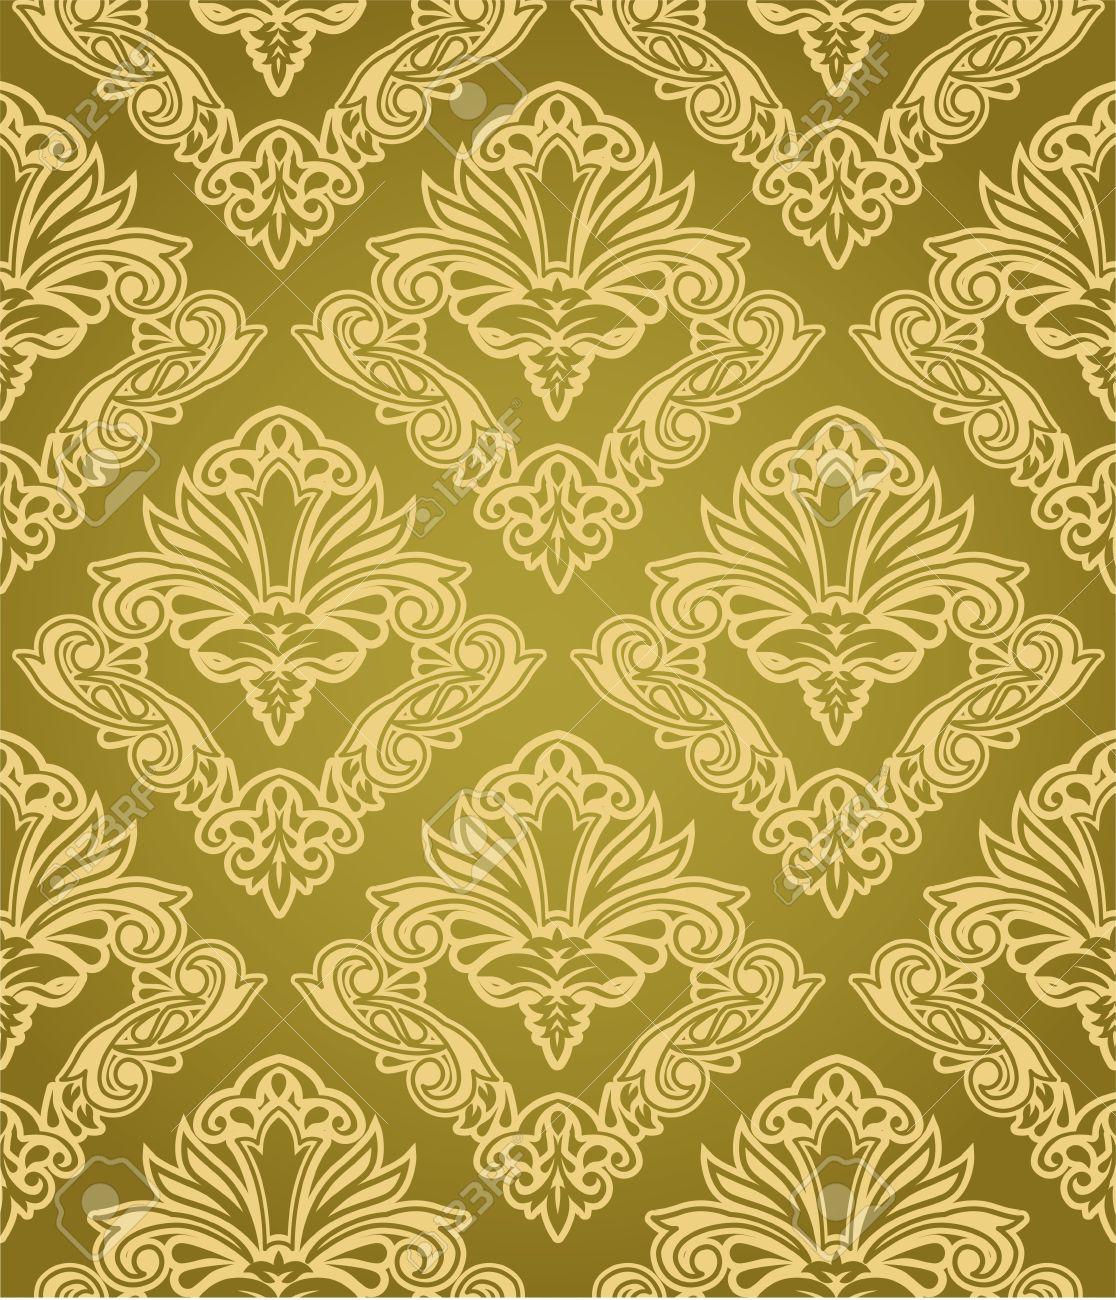 Seamless gold wallpaper pattern